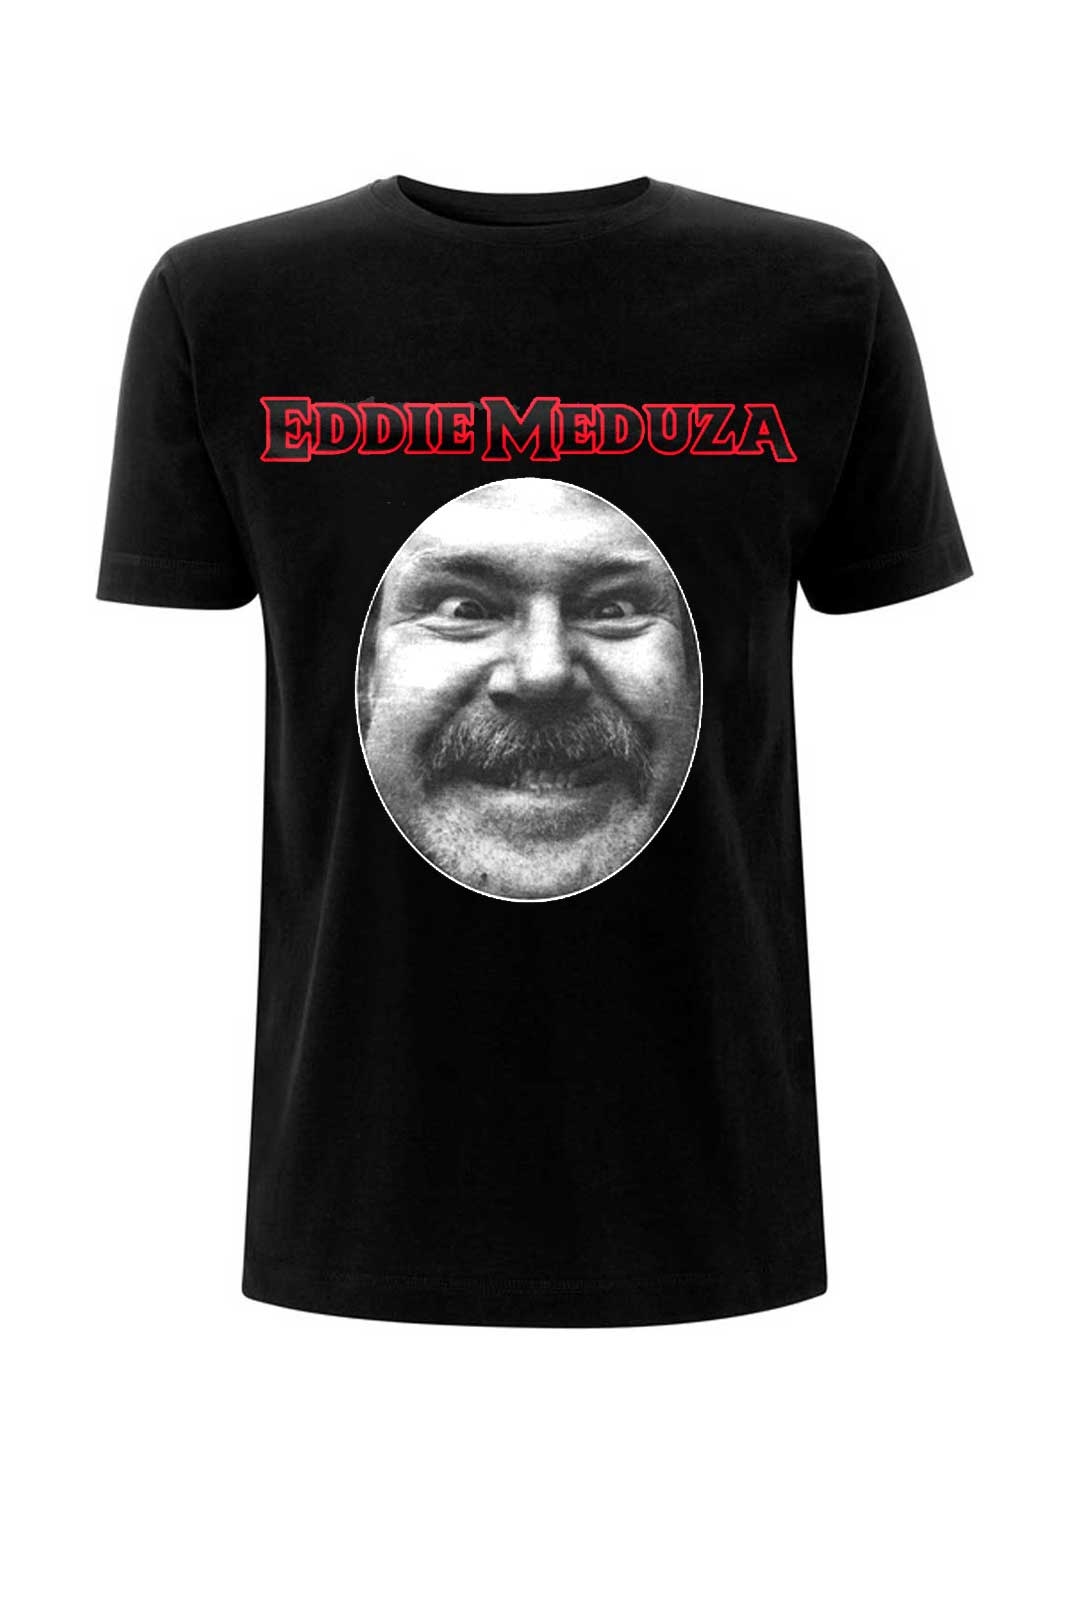 official merchandise tee eddie meduza face